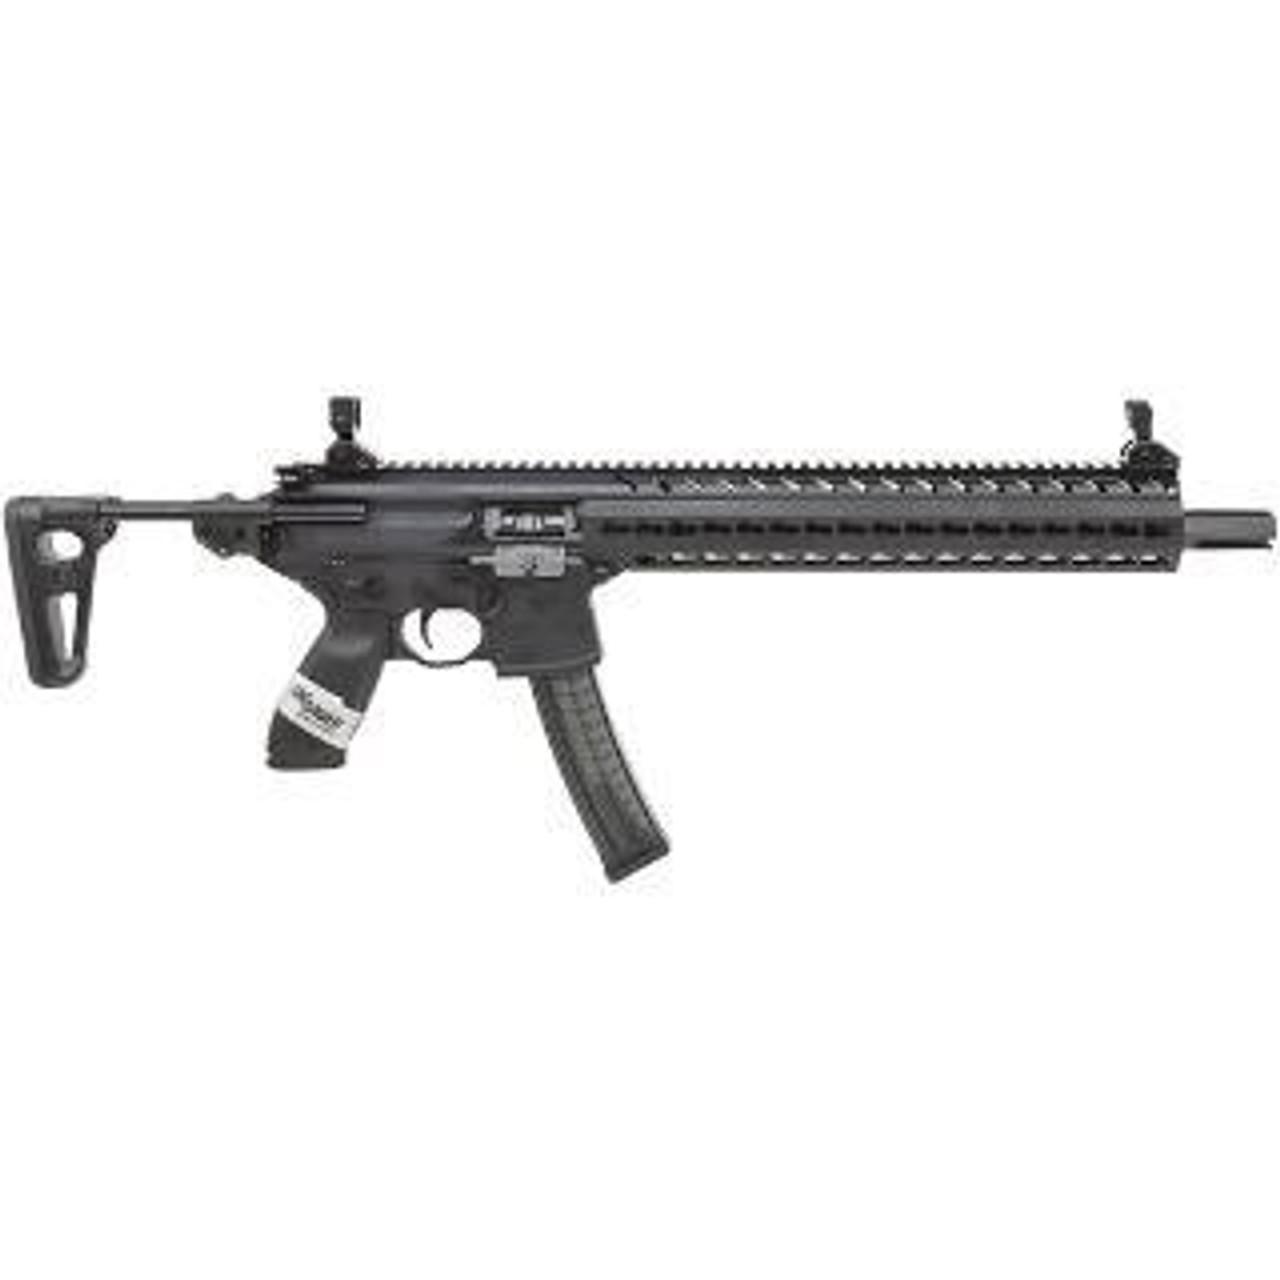 Sig Sauer MPX-Carbine CALIFORNIA LEGAL-9mm